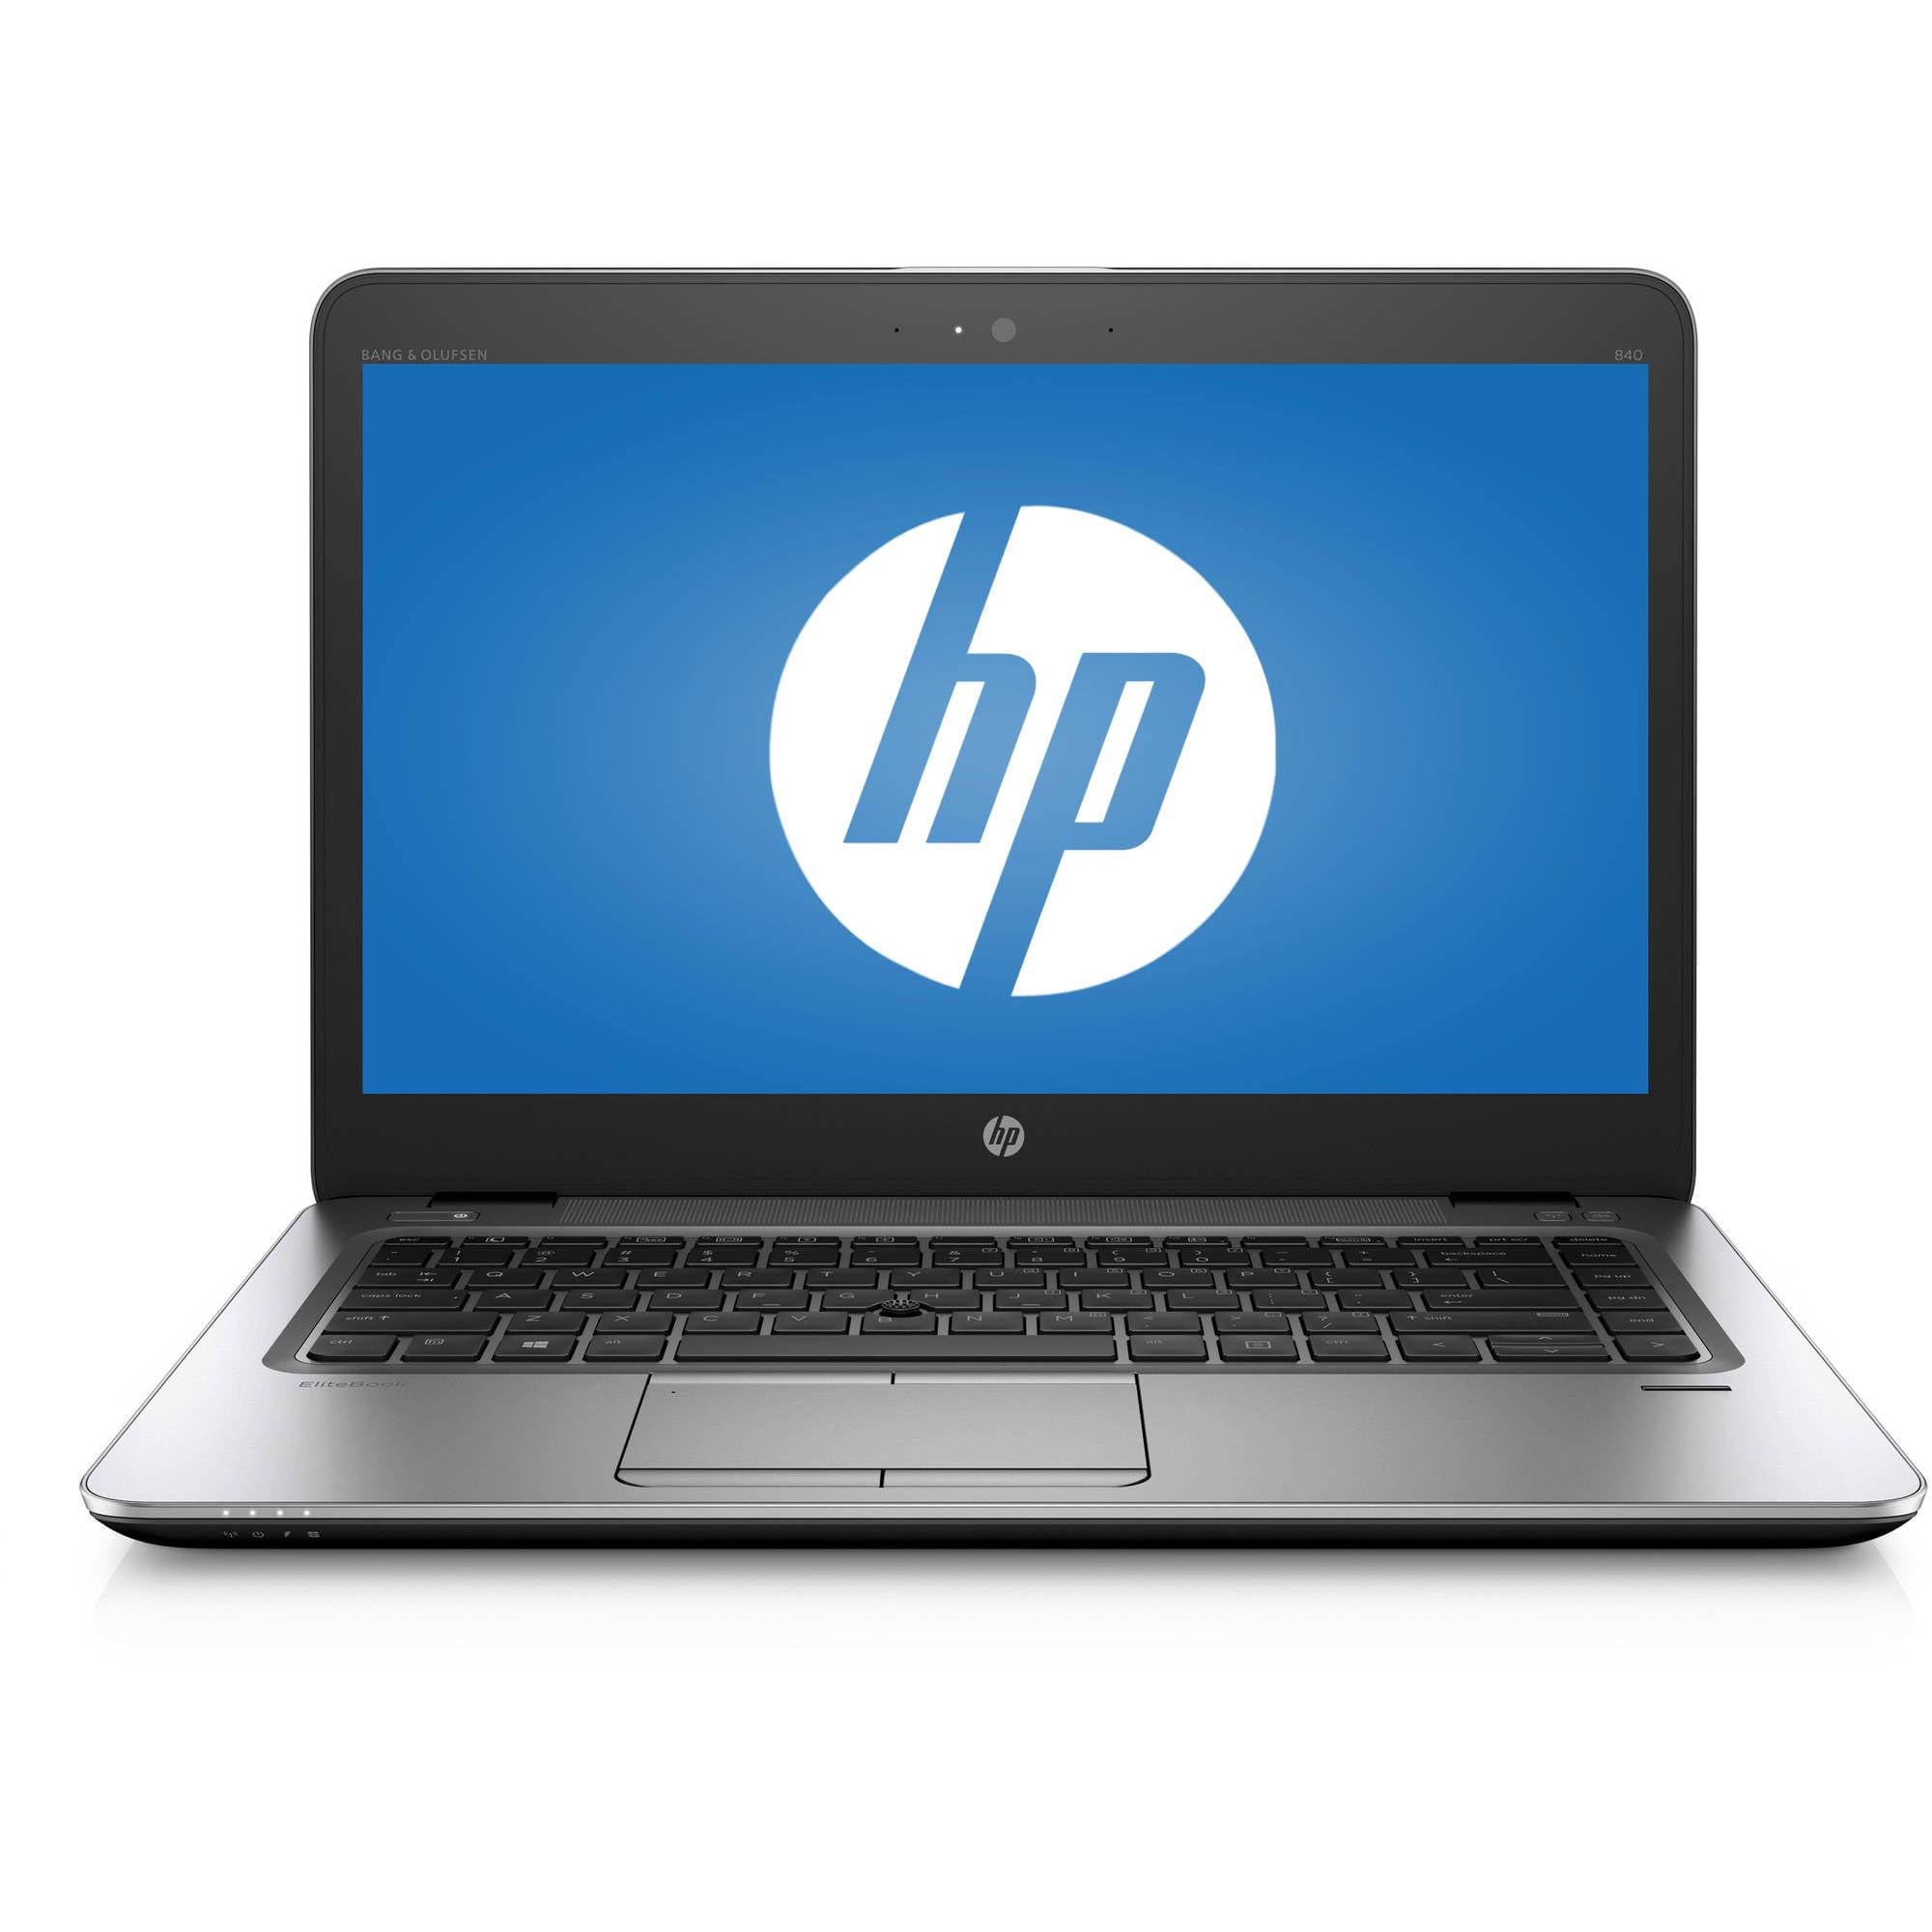 HP ELITEBOOK 850 G3 CONEXANT HD AUDIO TREIBER HERUNTERLADEN